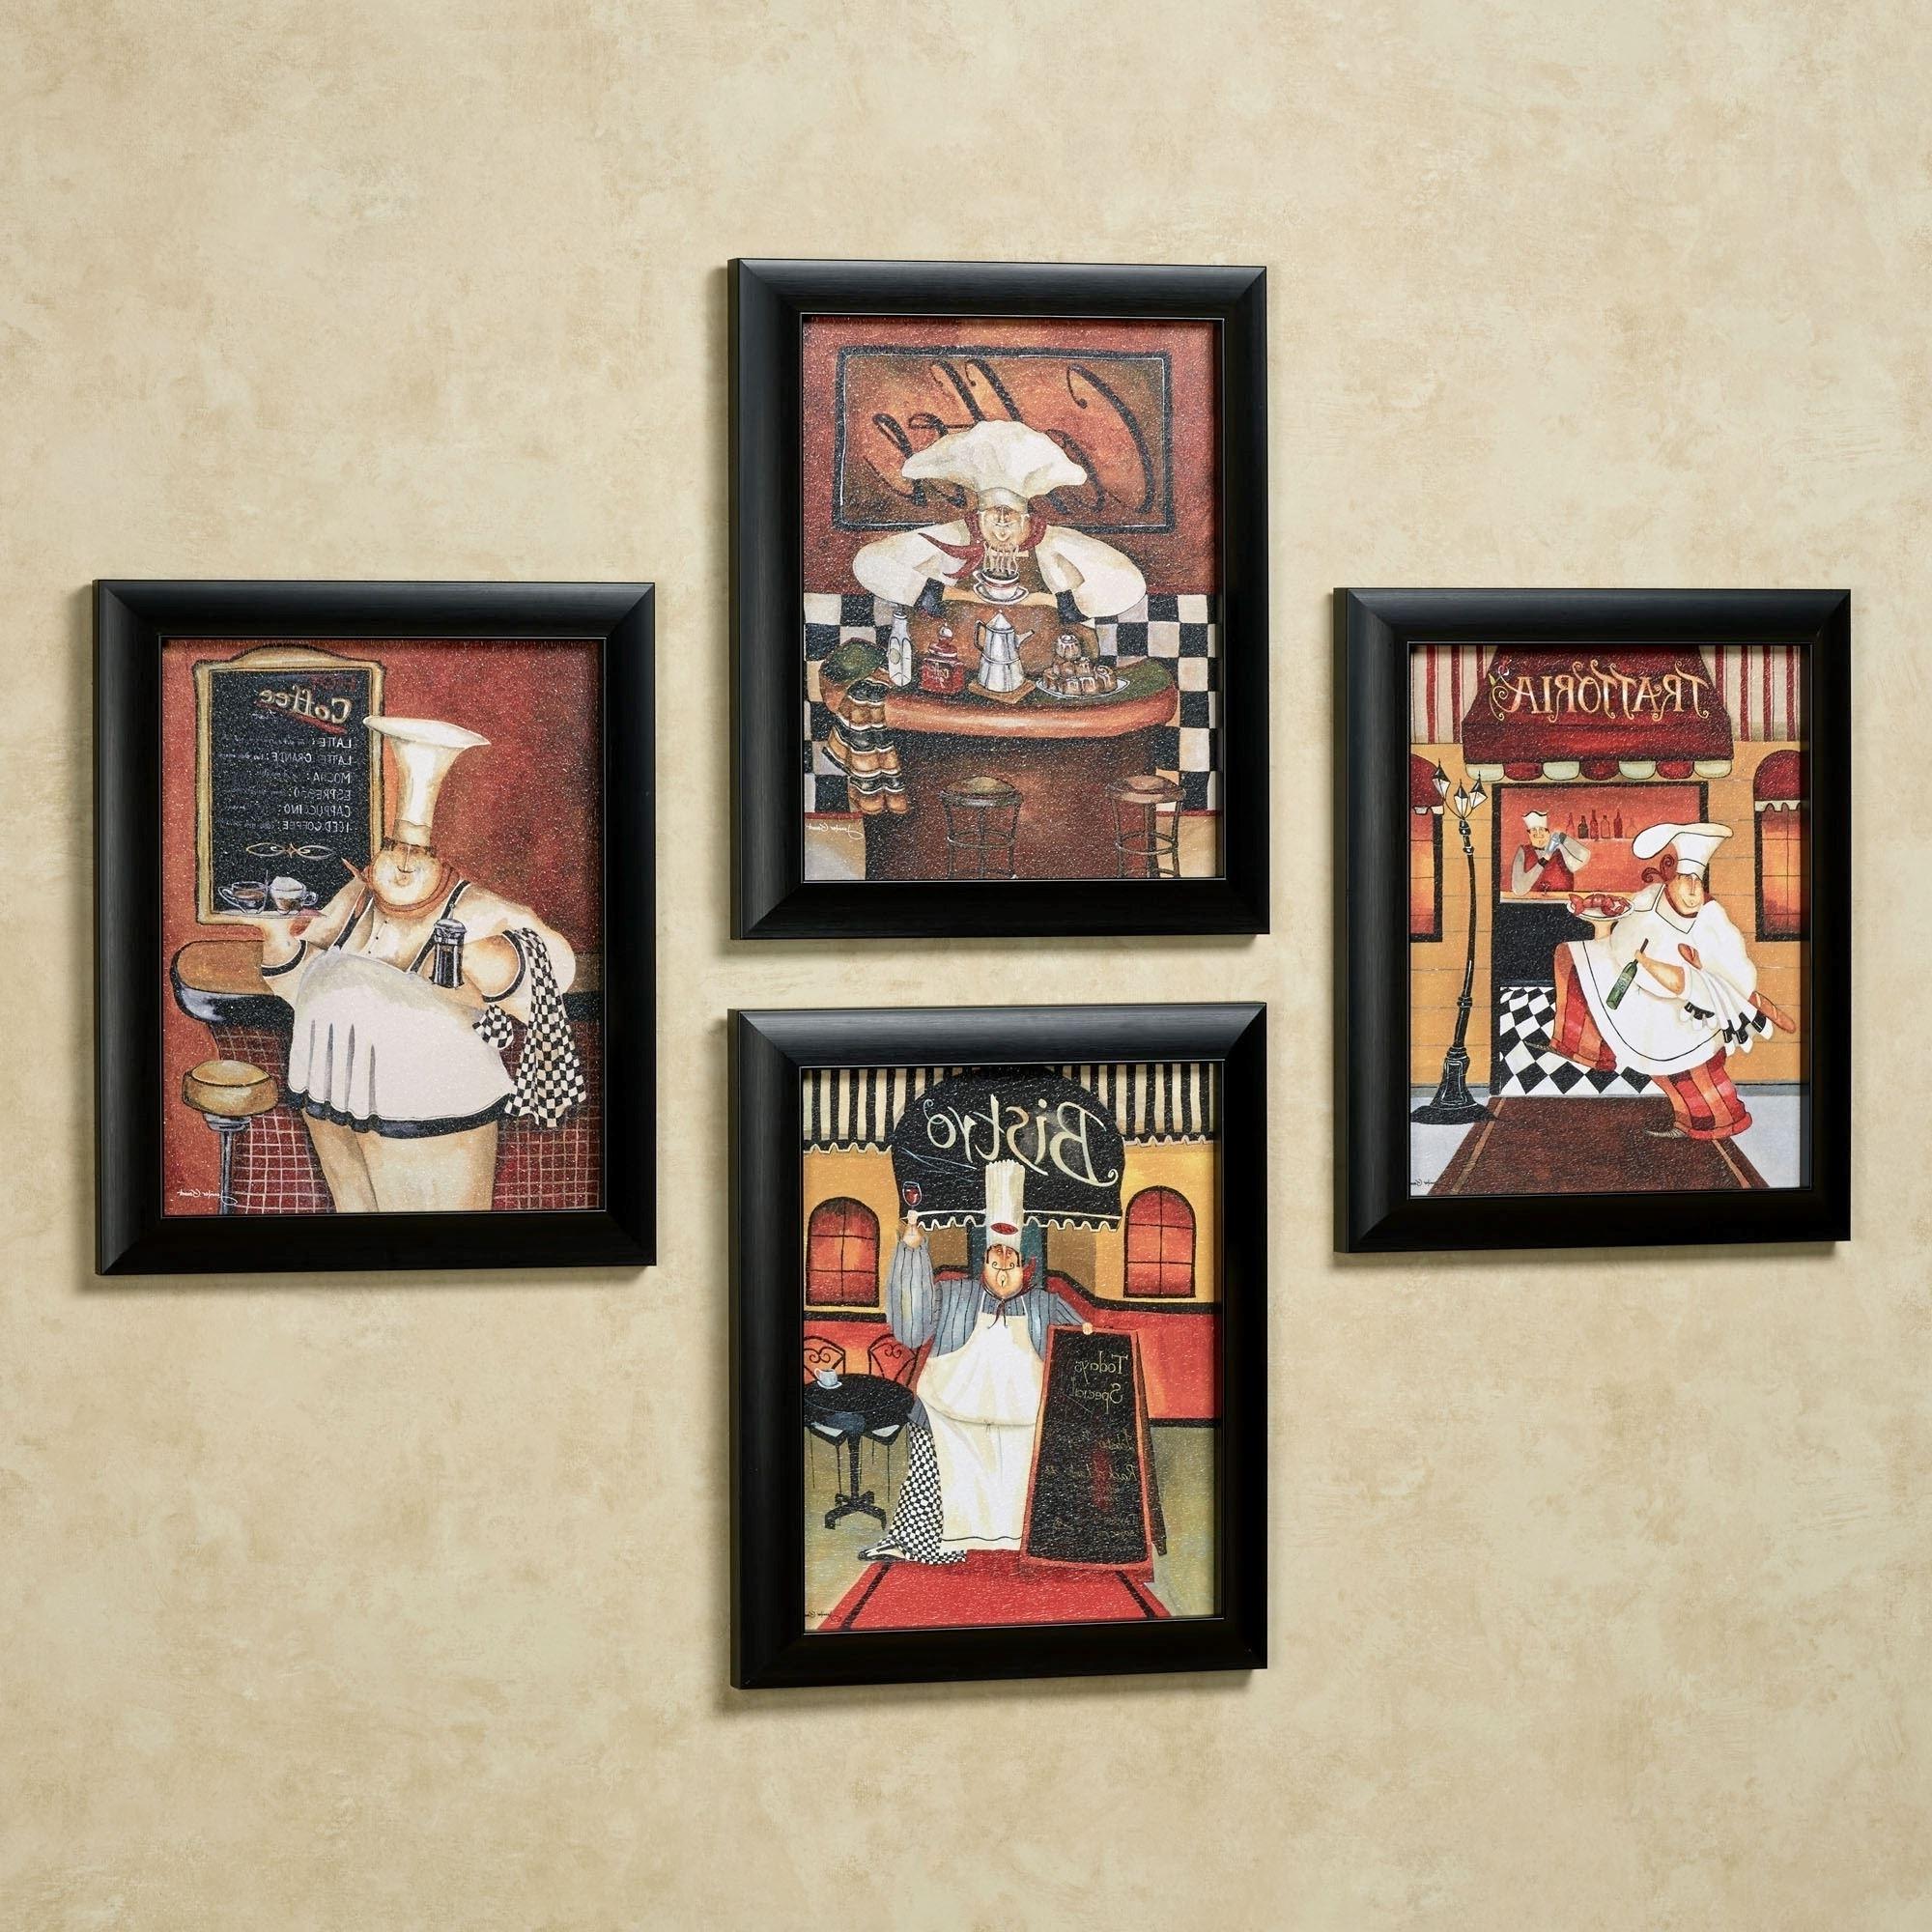 Preferred Sonoma Chef Framed Wall Art Set Throughout Framed Wall Art Regarding Italian Overlook Framed Wall Art Sets (View 5 of 15)